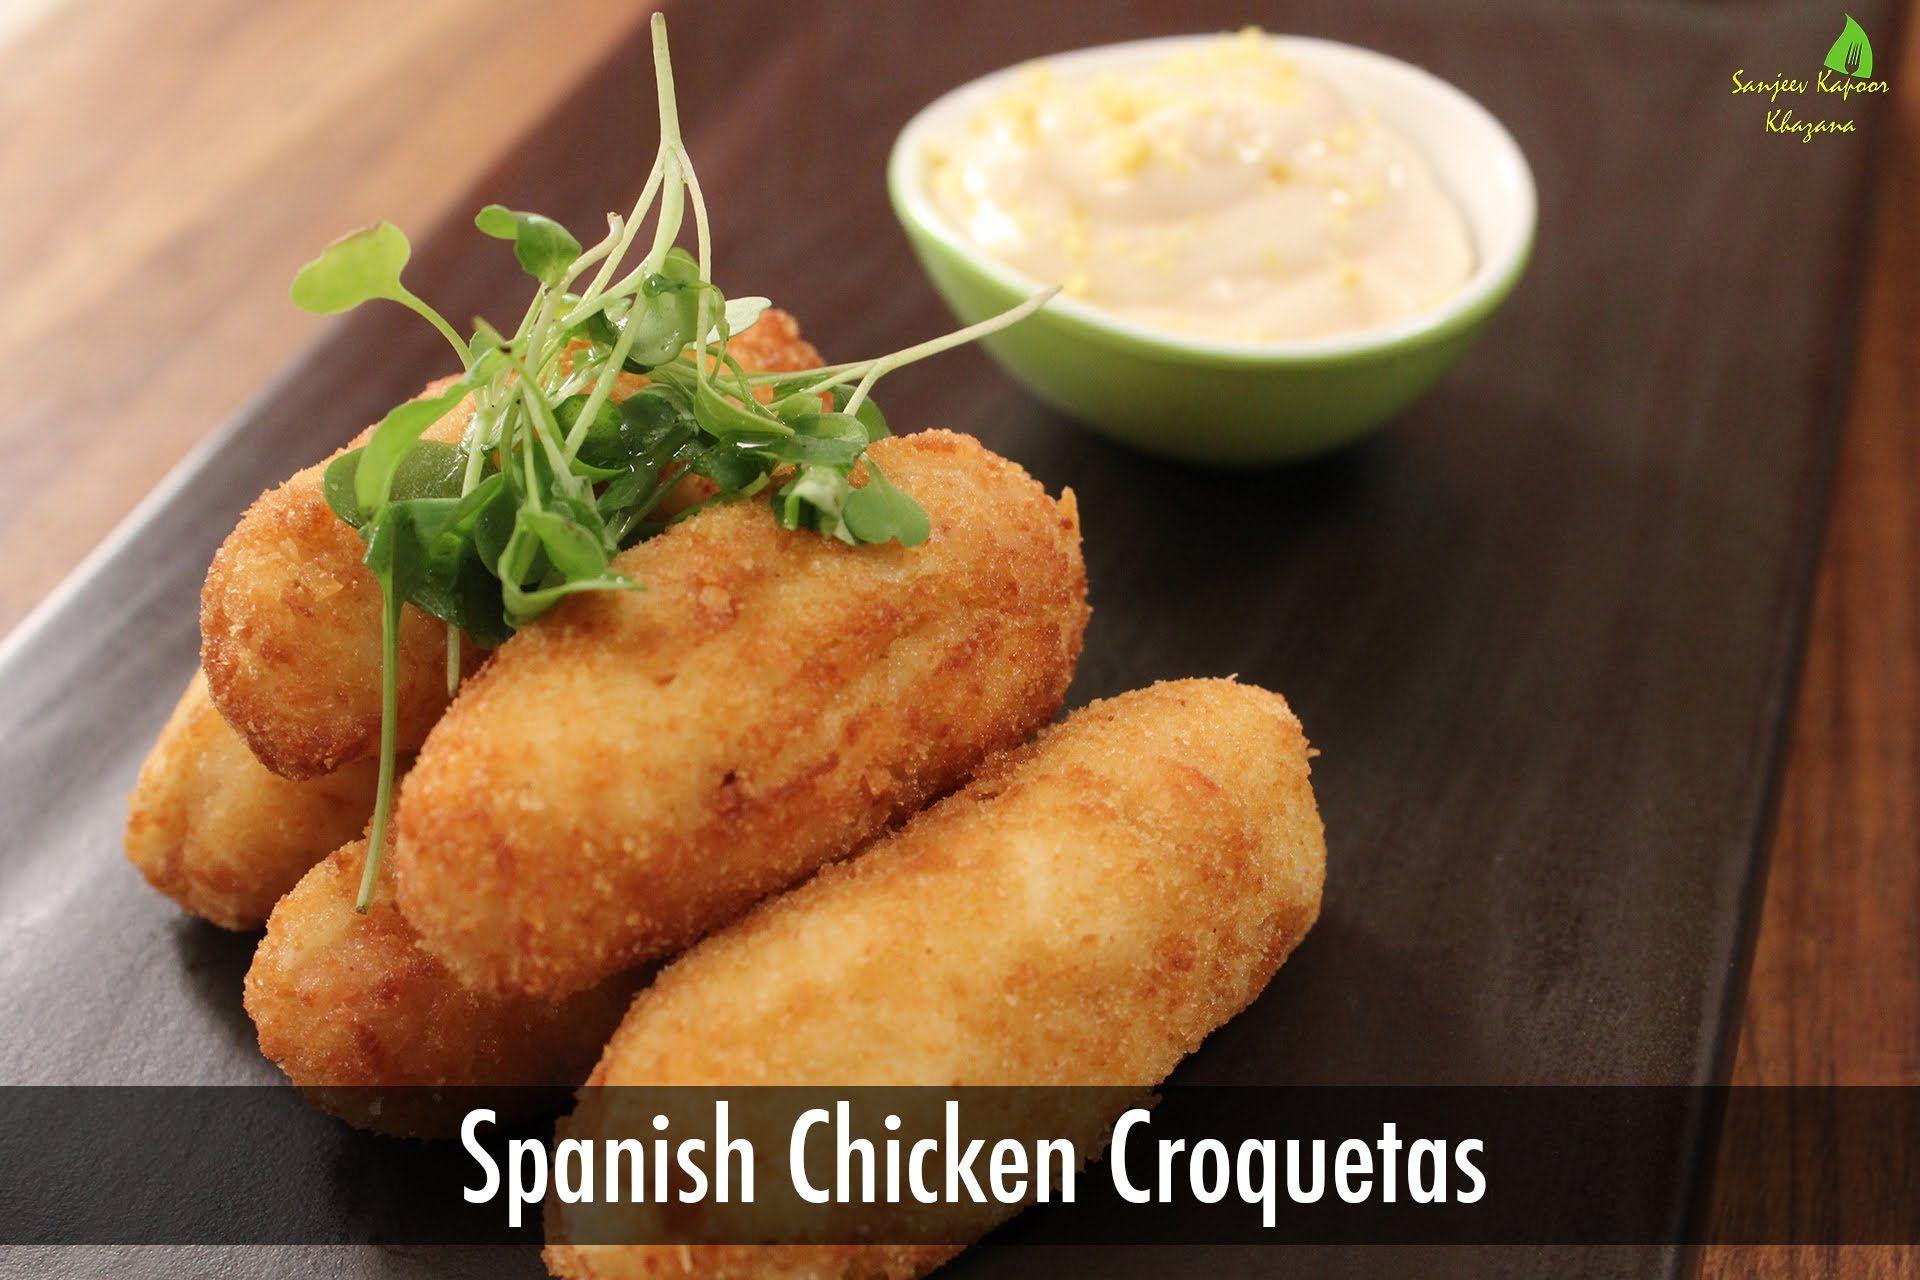 Spanish chicken croquetas sanjeev kapoor khazana welcome to alpa spanish chicken croquetas sanjeev kapoor khazana forumfinder Choice Image